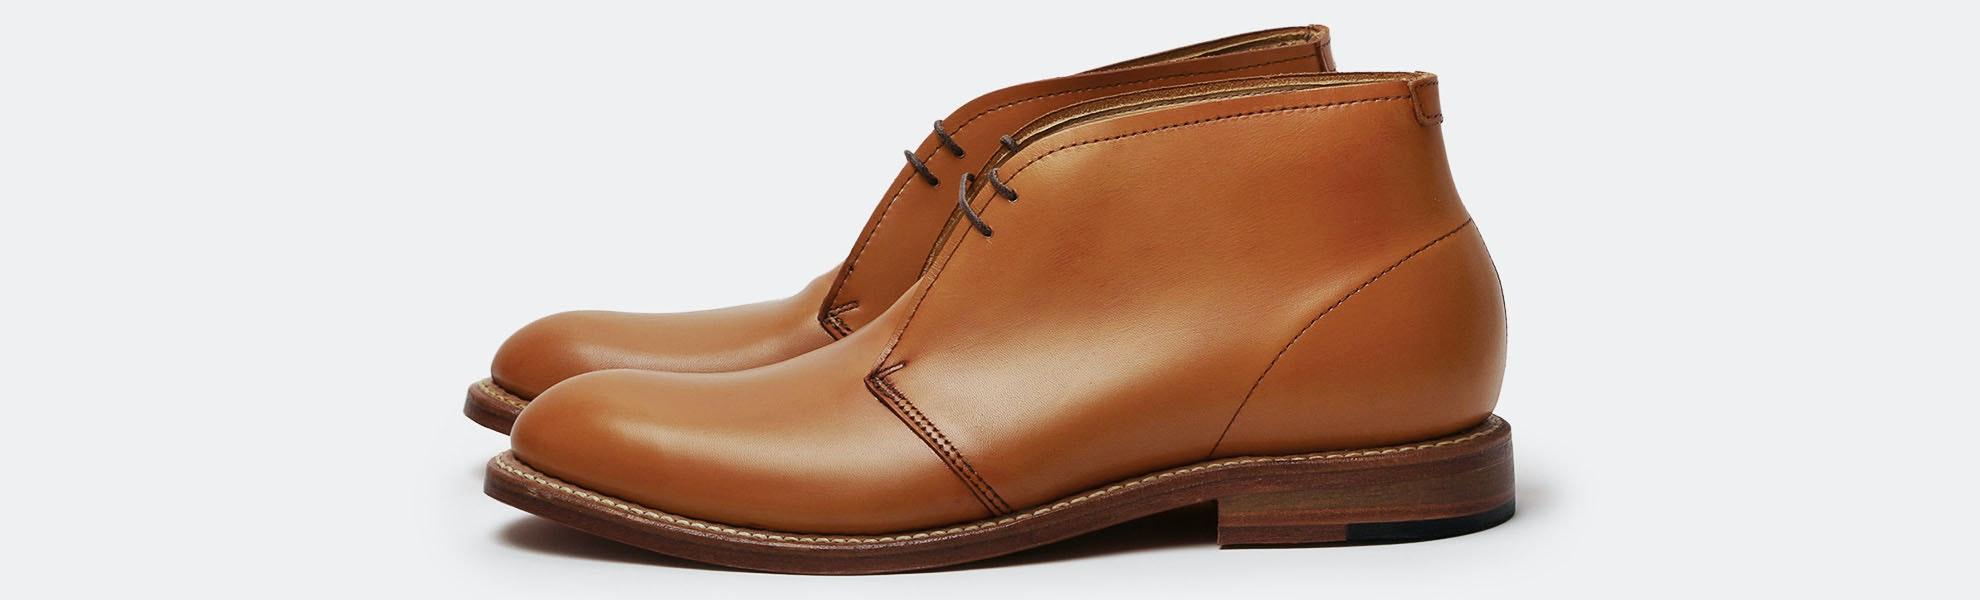 Oak Street Bootmakers Chukka – Massdrop Exclusive